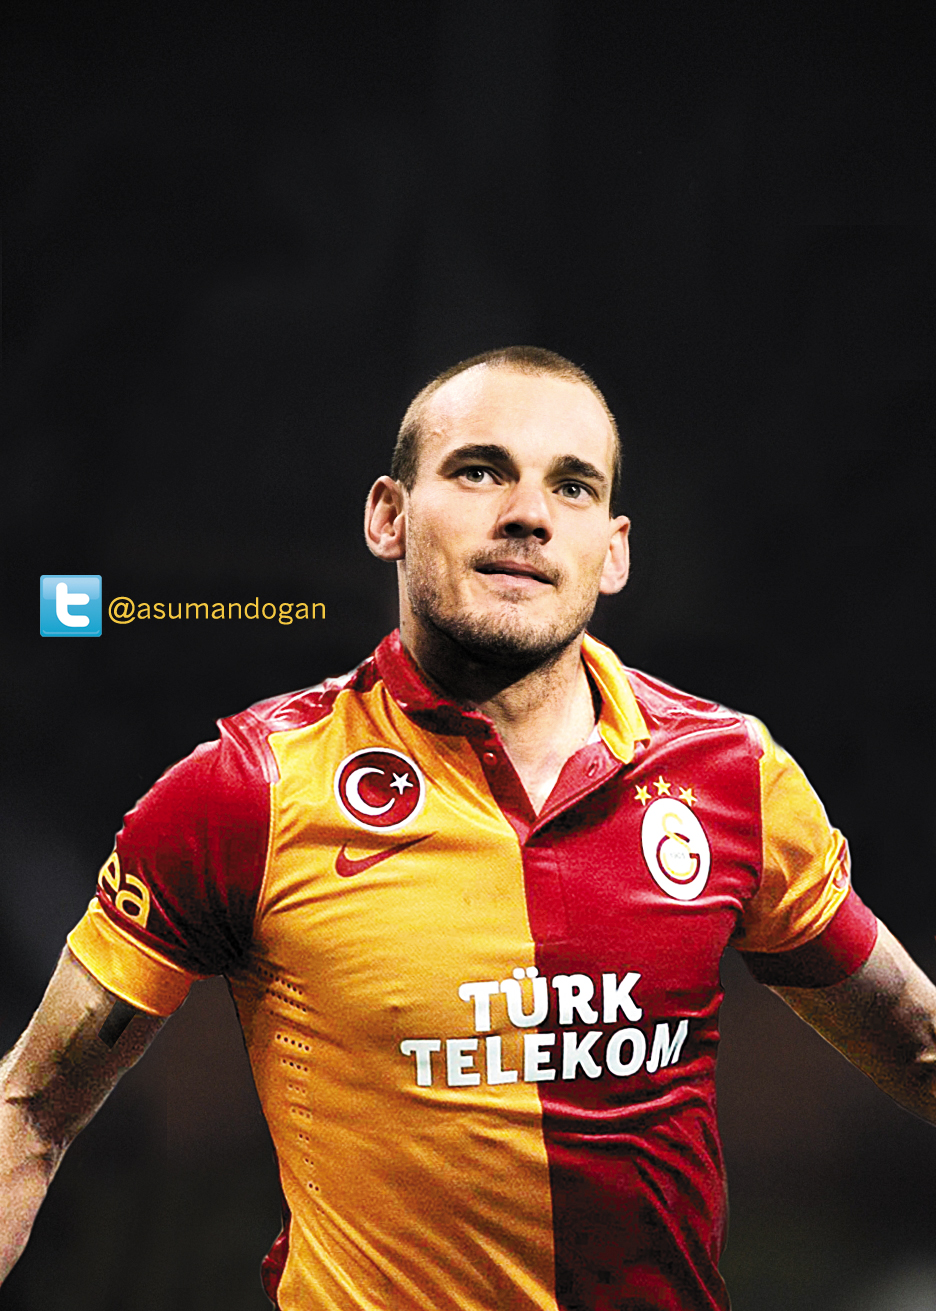 http://fc05.deviantart.net/fs71/f/2013/012/6/0/wesley_sneijder___galatasaray_by_asumandogan-d5r8ame.jpg